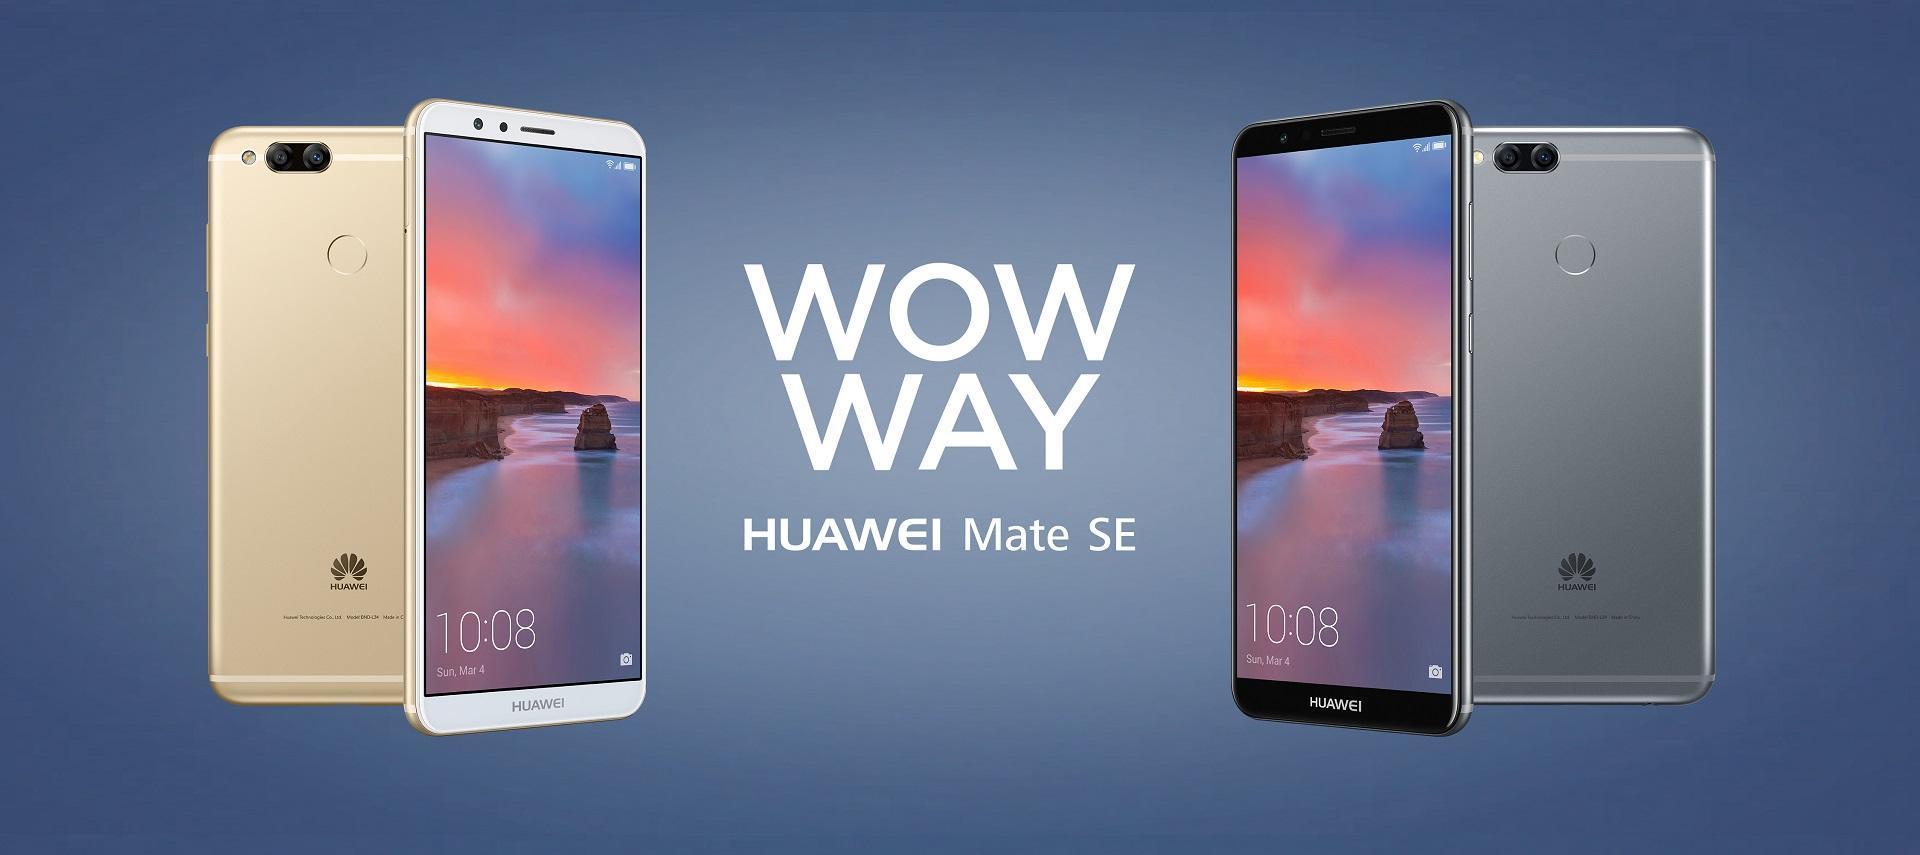 Huawei Mate SE ma teraz Androida 8.0 Oreo